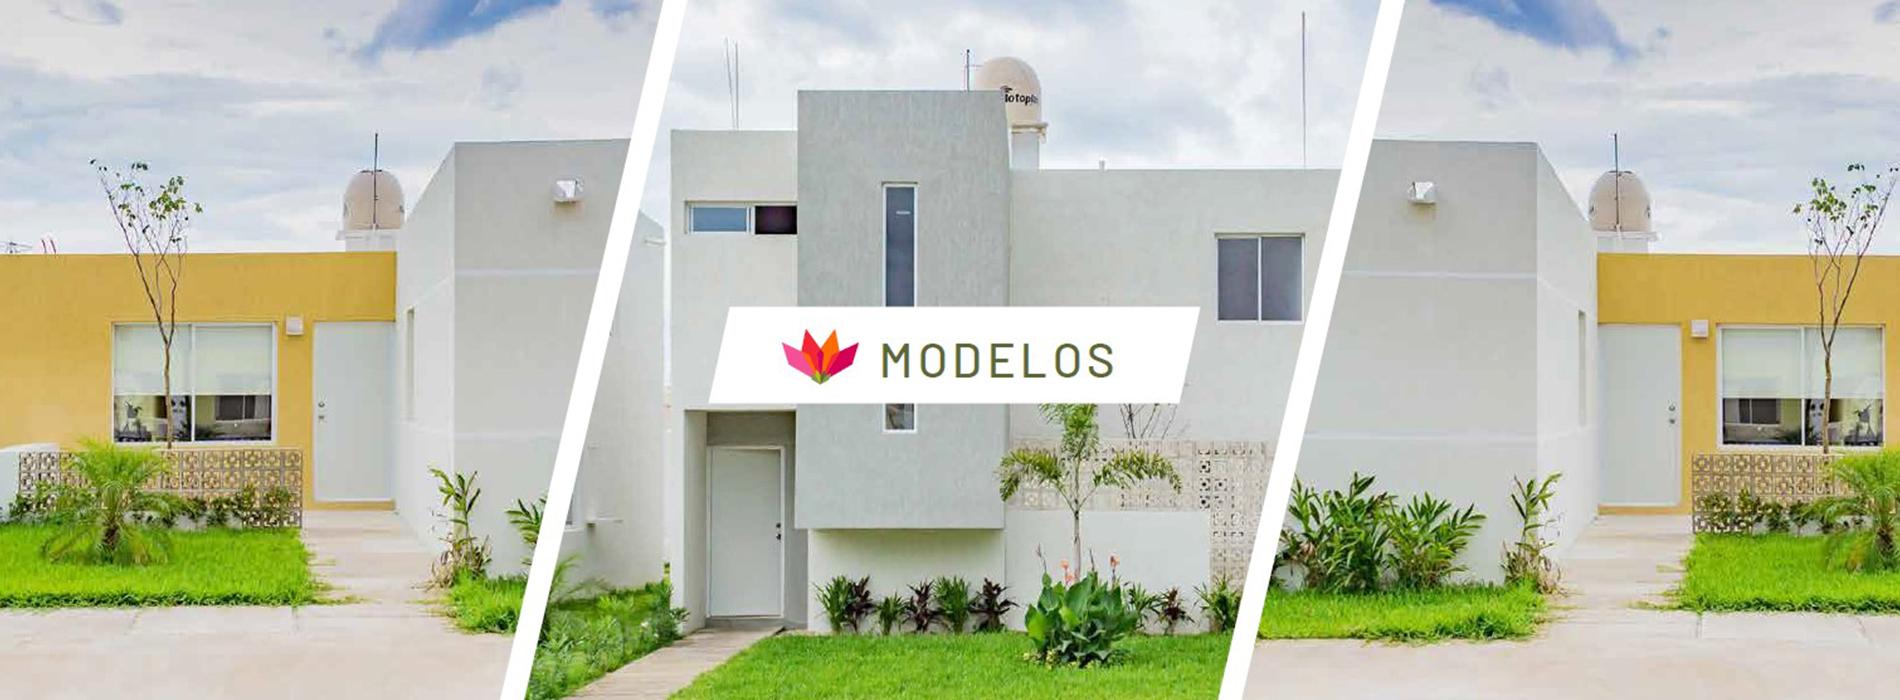 Casas Venta Mérida Almasur Goodlers